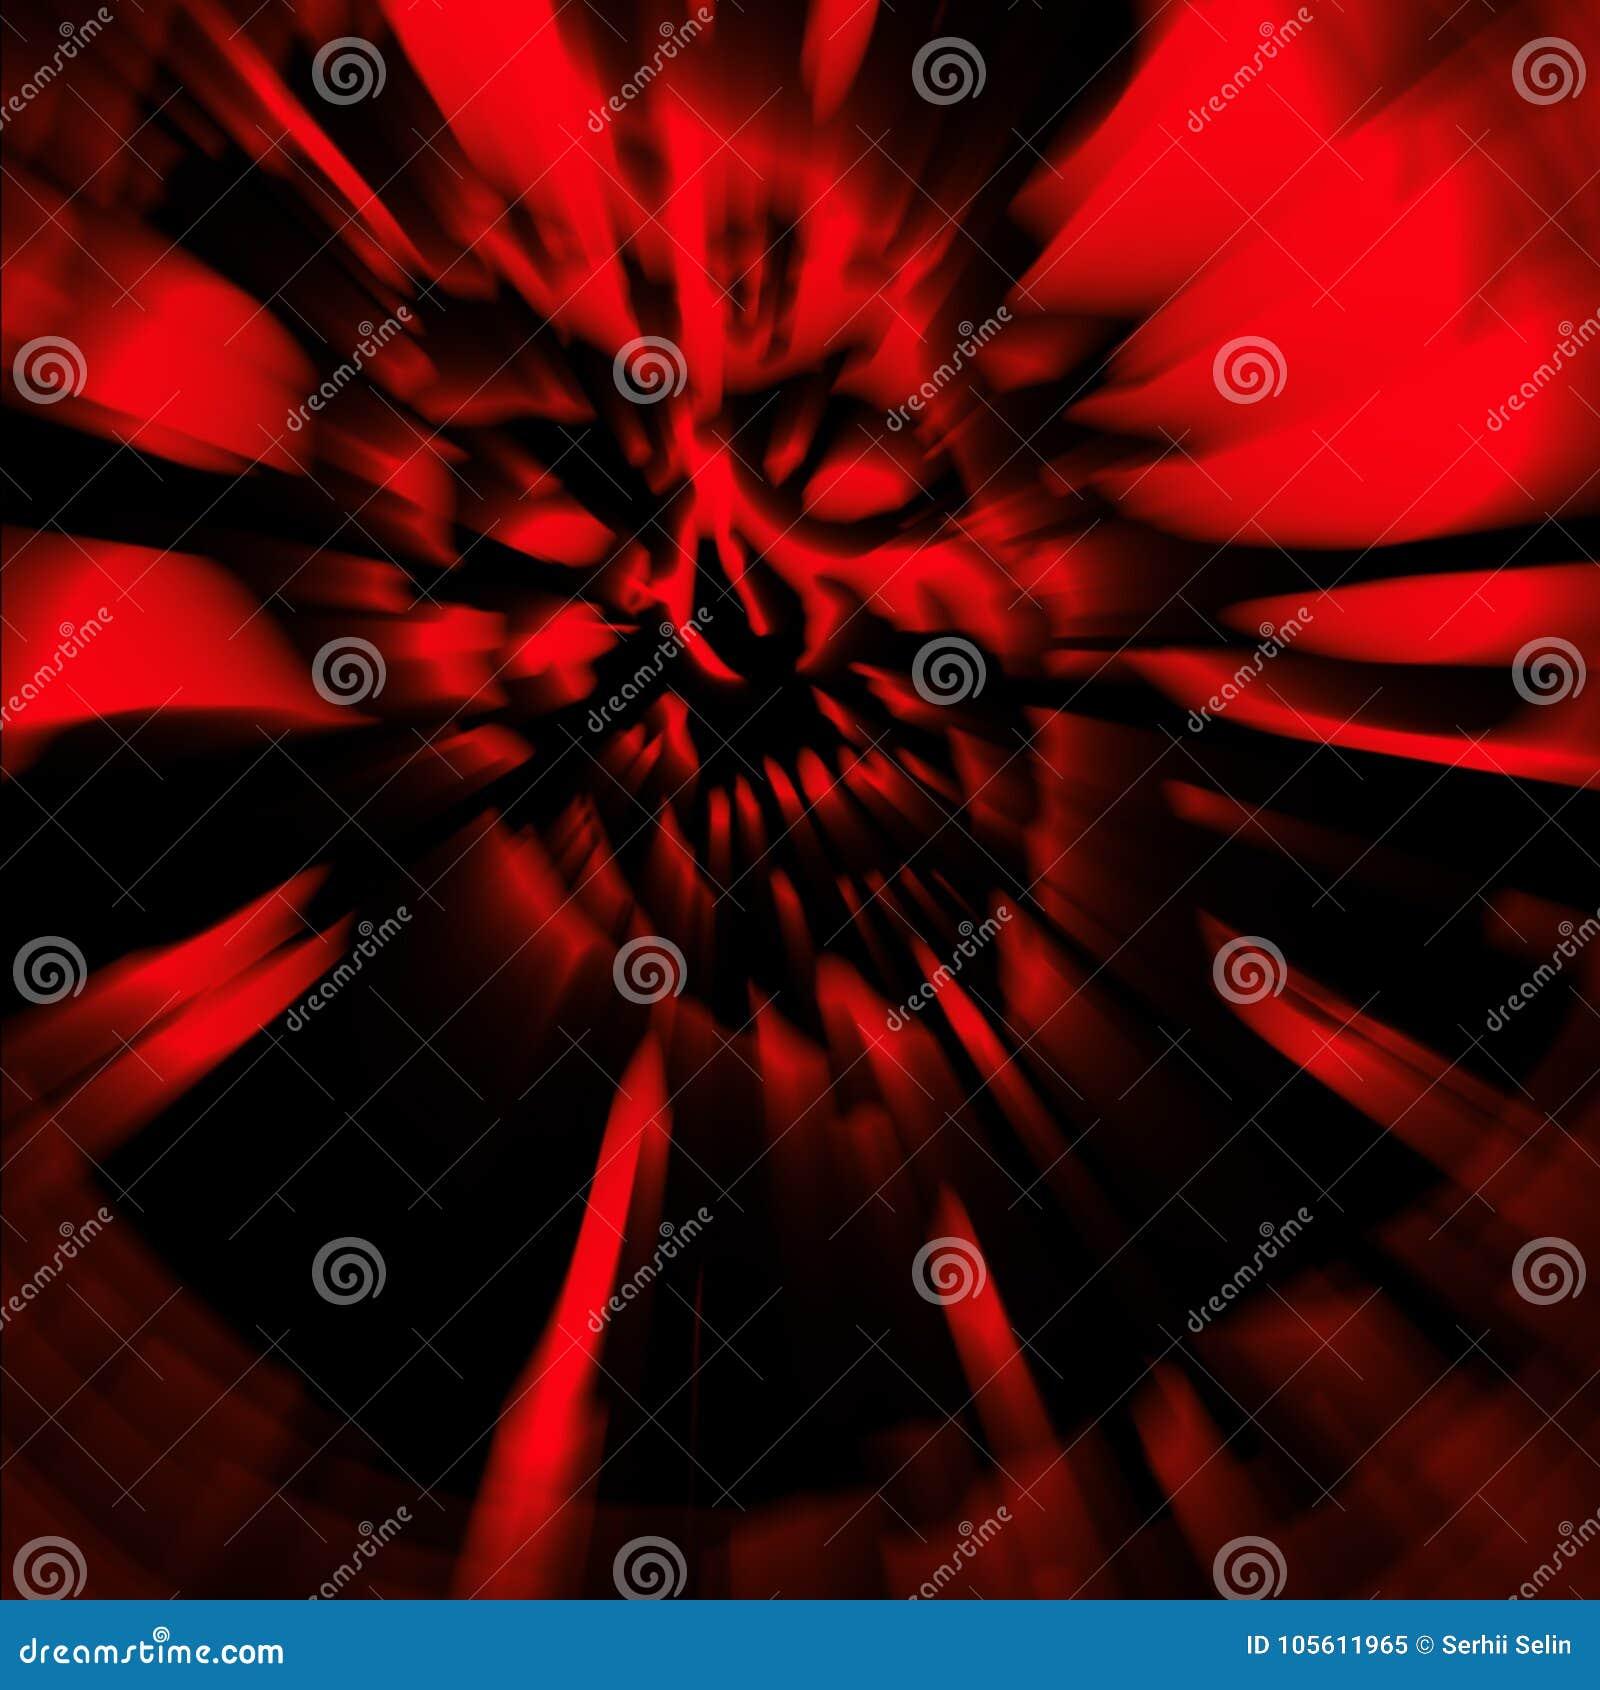 terrible zombie dead head cover wallpaper red illustration genre horror danger character face blur effect color 105611965